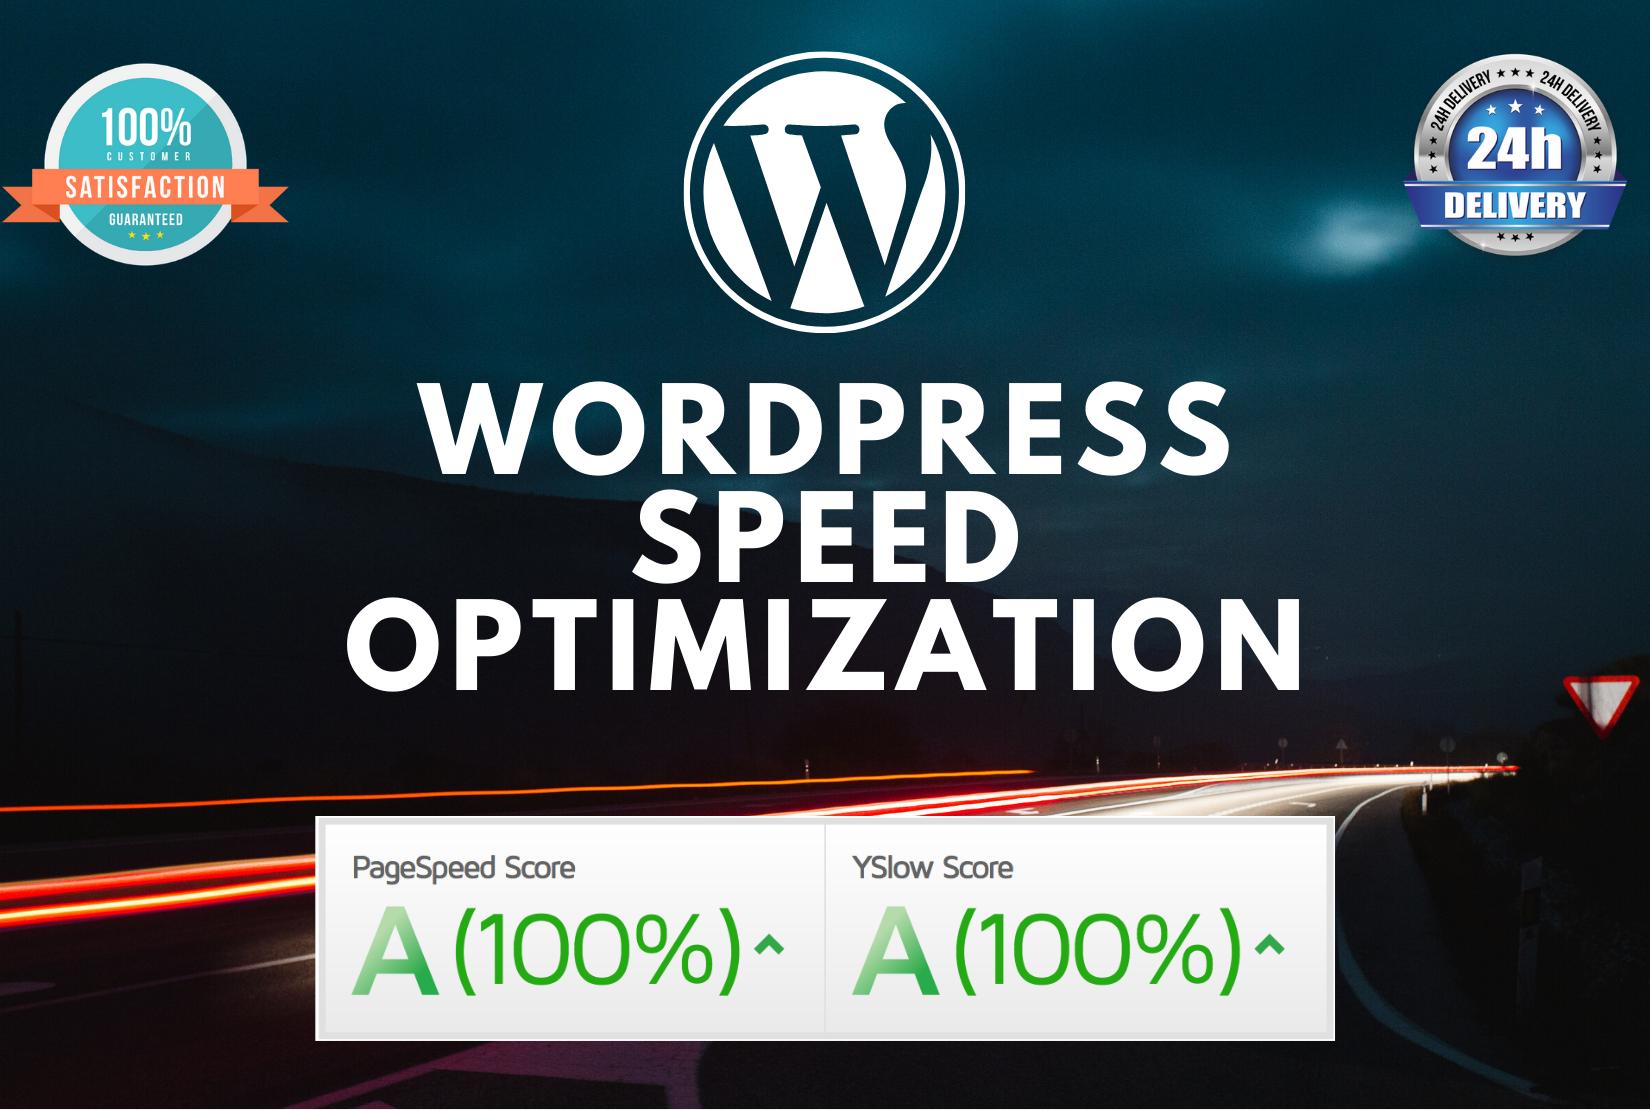 I will do wordpress speed optimization and increase gtmetrix page speed